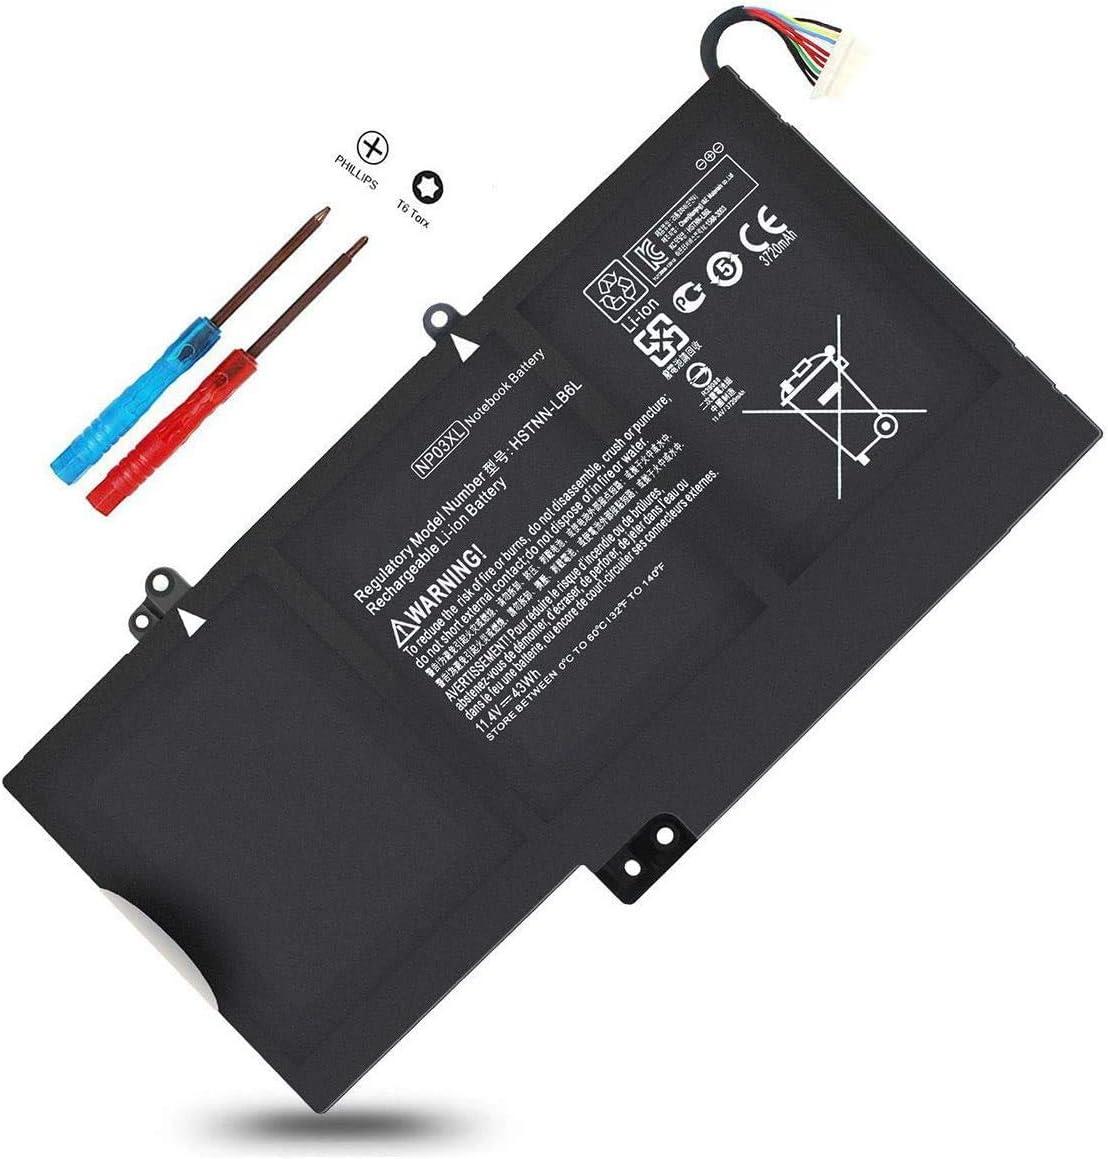 760944-421 NP03XL NPO3XL Notebook Battery for HP Envy 15-U010DX 15-U011DX 15-U110DX 15-U111DX 15-U483CL 15-U493CL,Pavilion X360 13-A010DX 13-A013CL 13-A012DX 13-A110DX 761230-005 TPN-Q147 HSTNN-LB6L